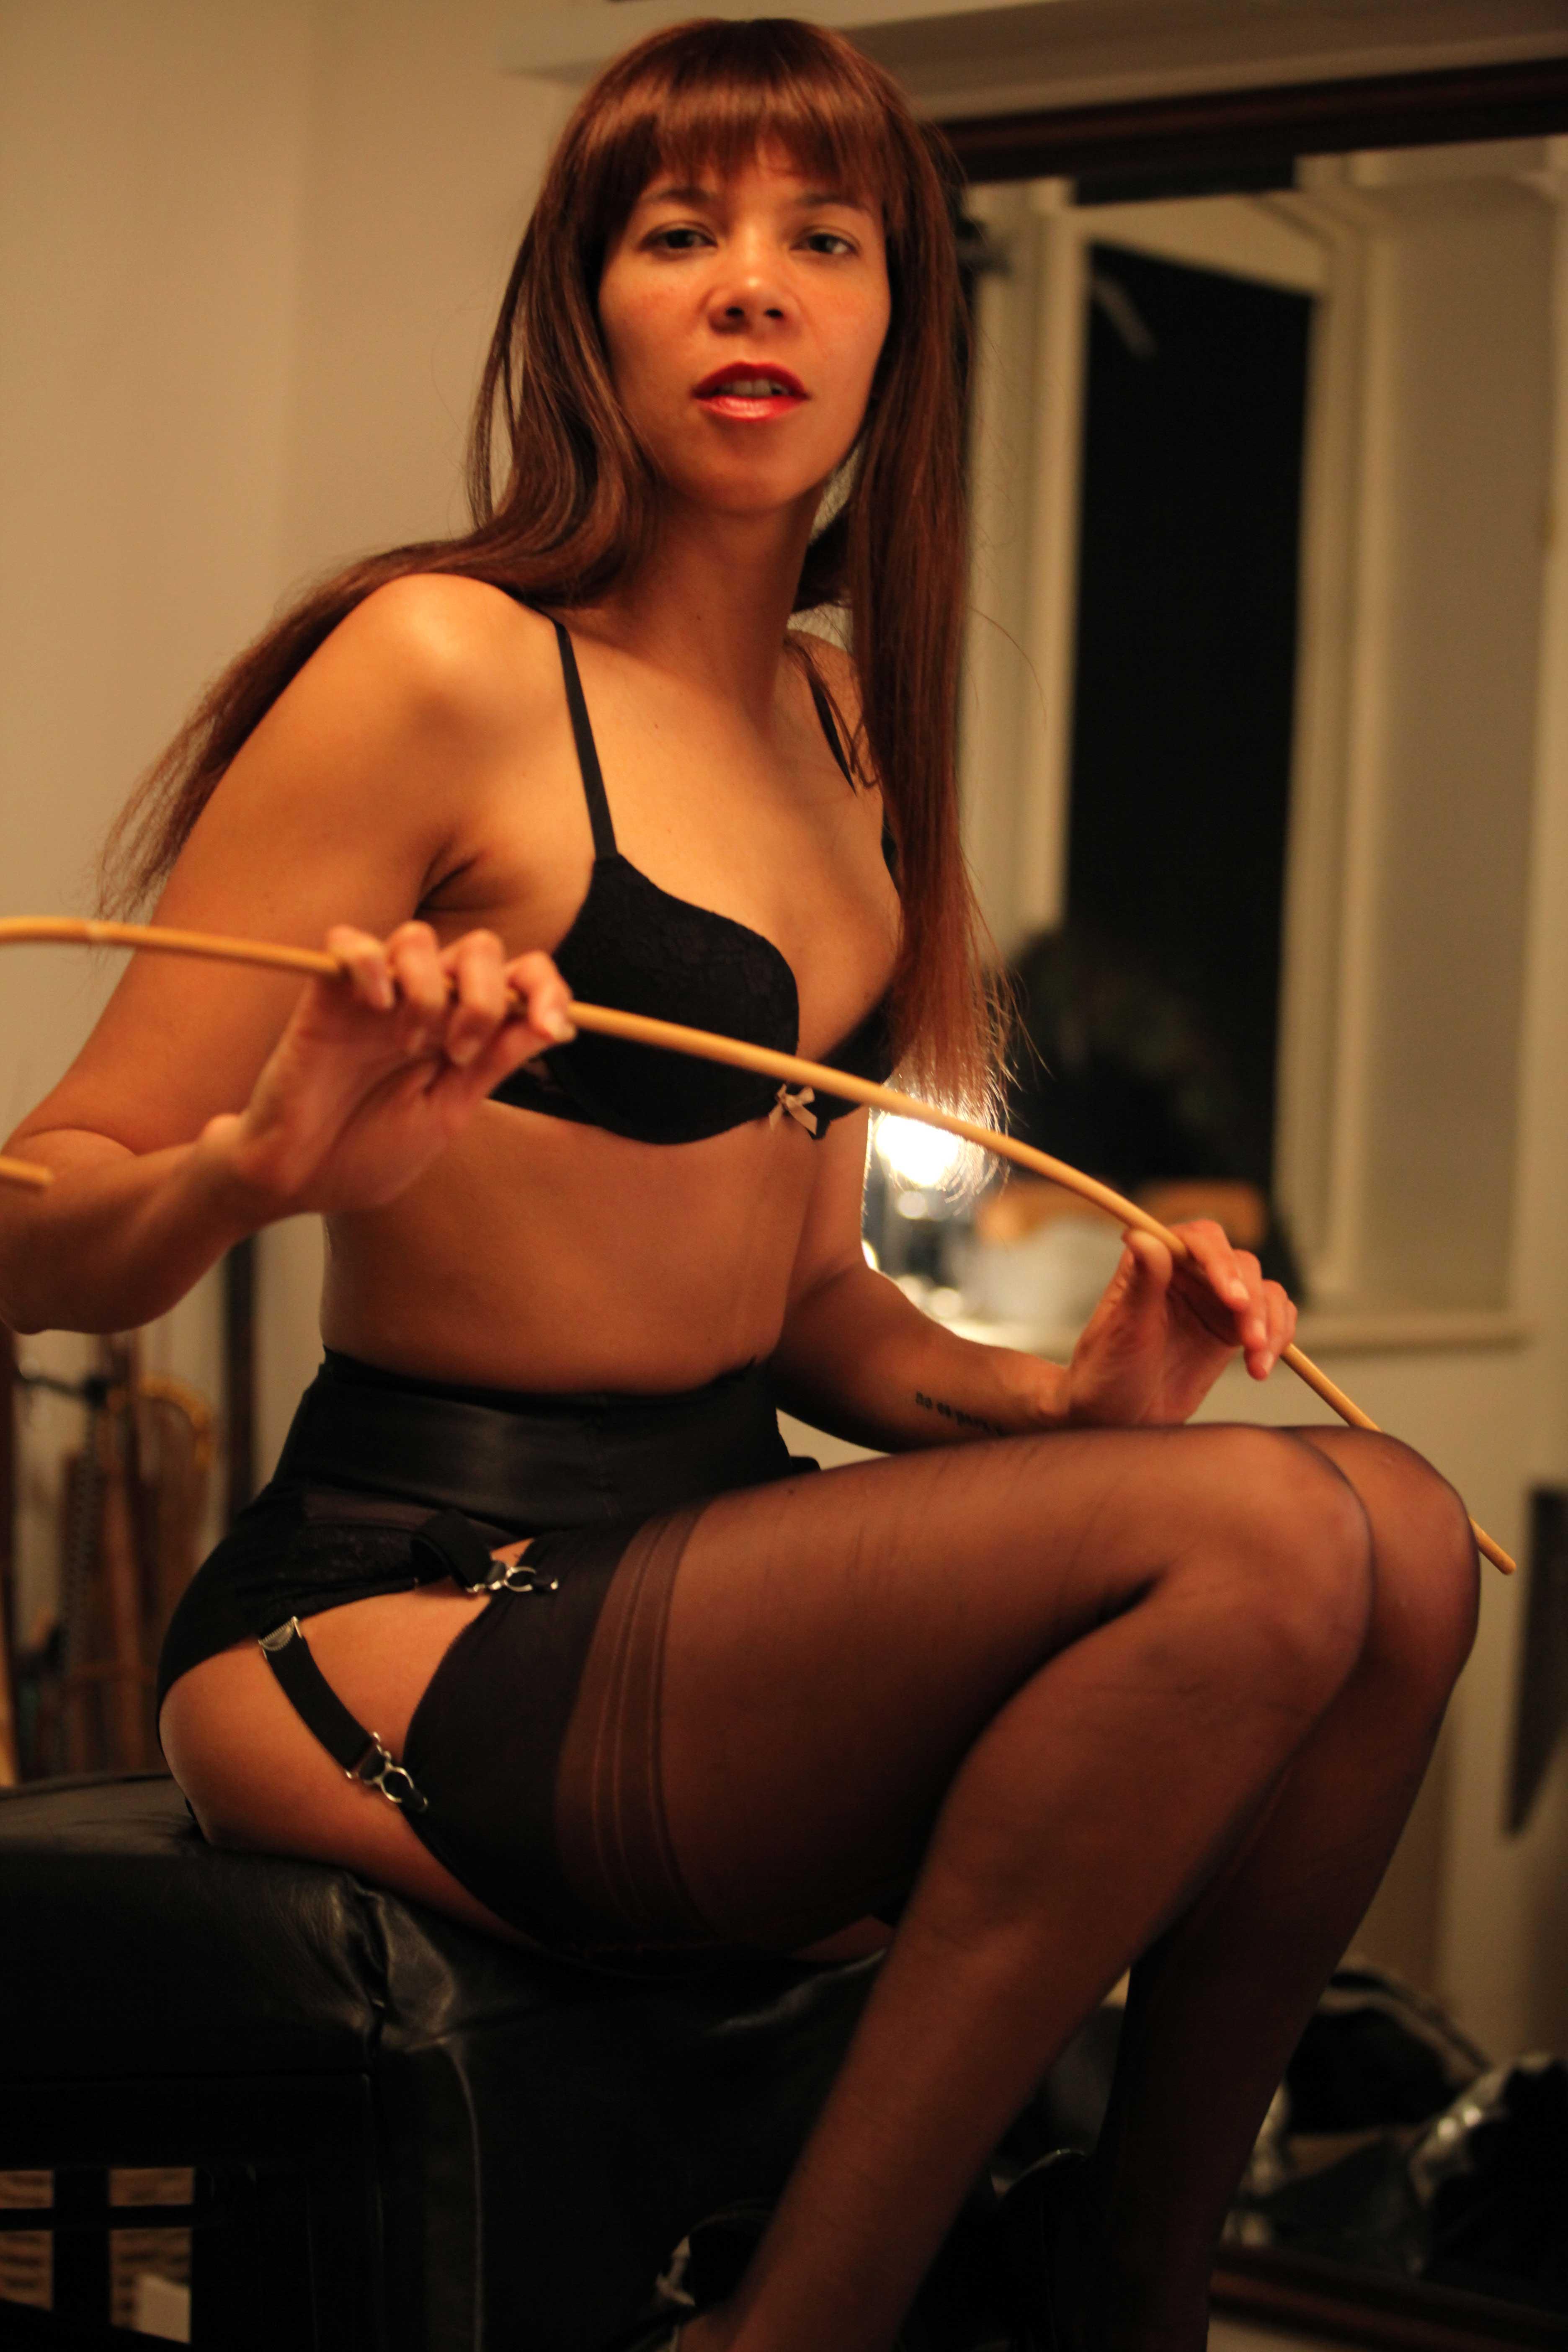 strict-london-mistress-punishment-humiliation-kings-cross-london